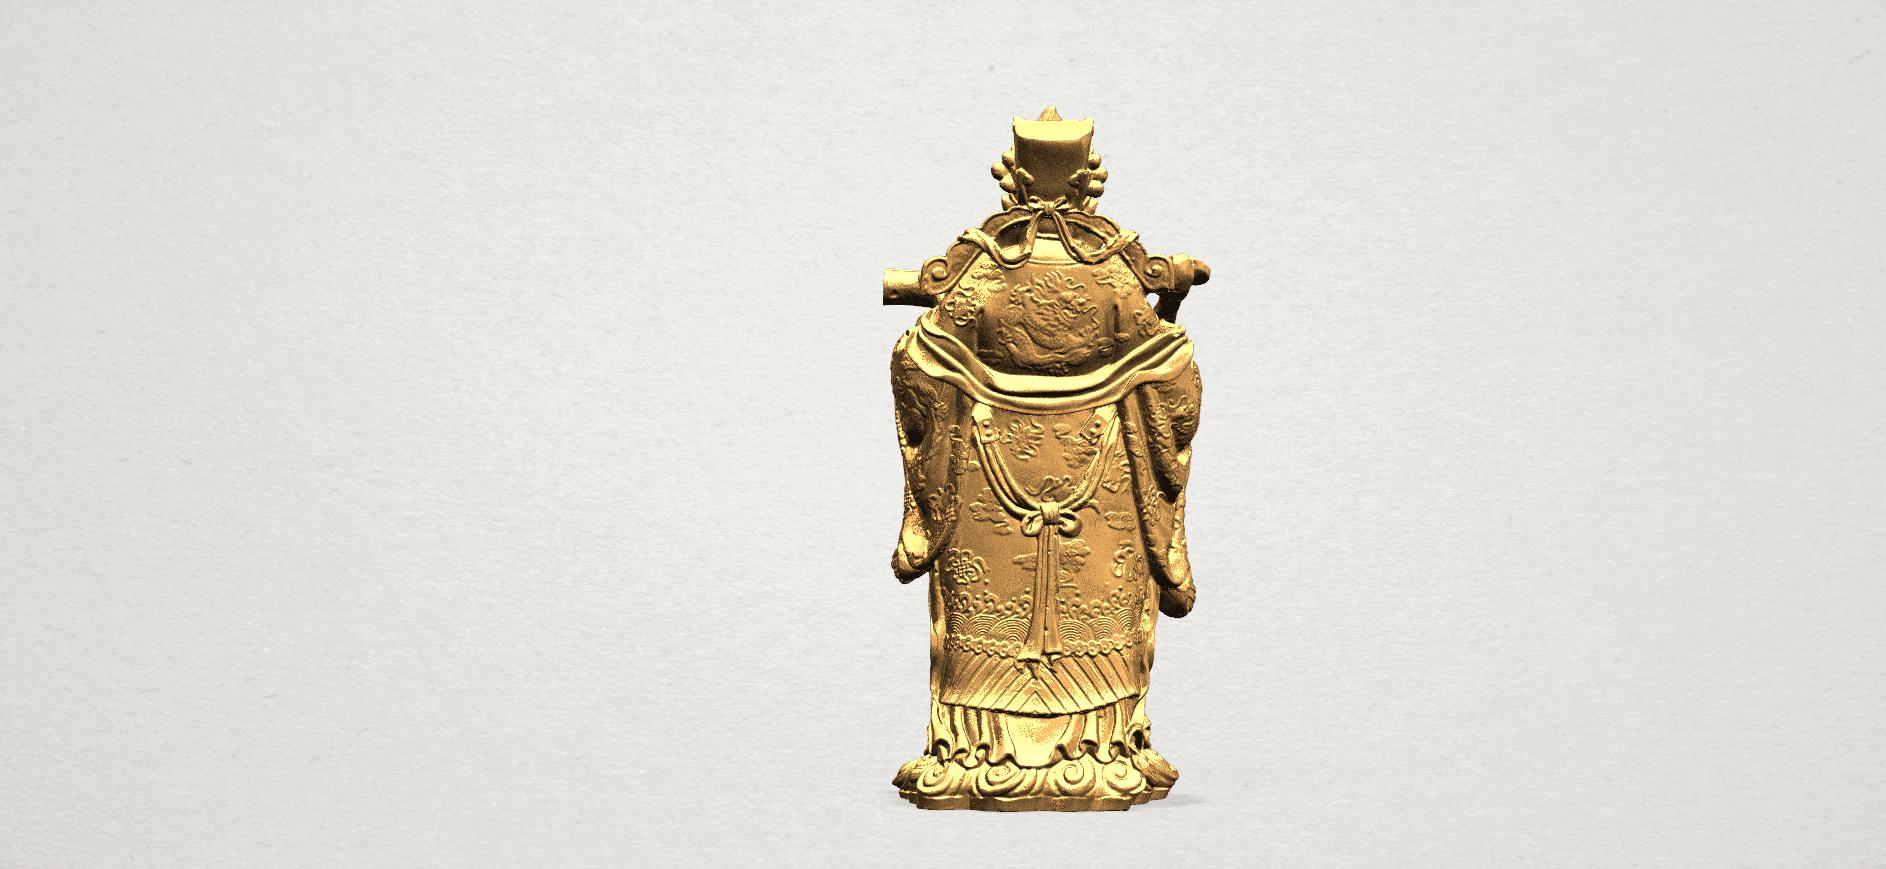 God of Treasure - B07.png Download free STL file God of Treasure • 3D printing model, GeorgesNikkei